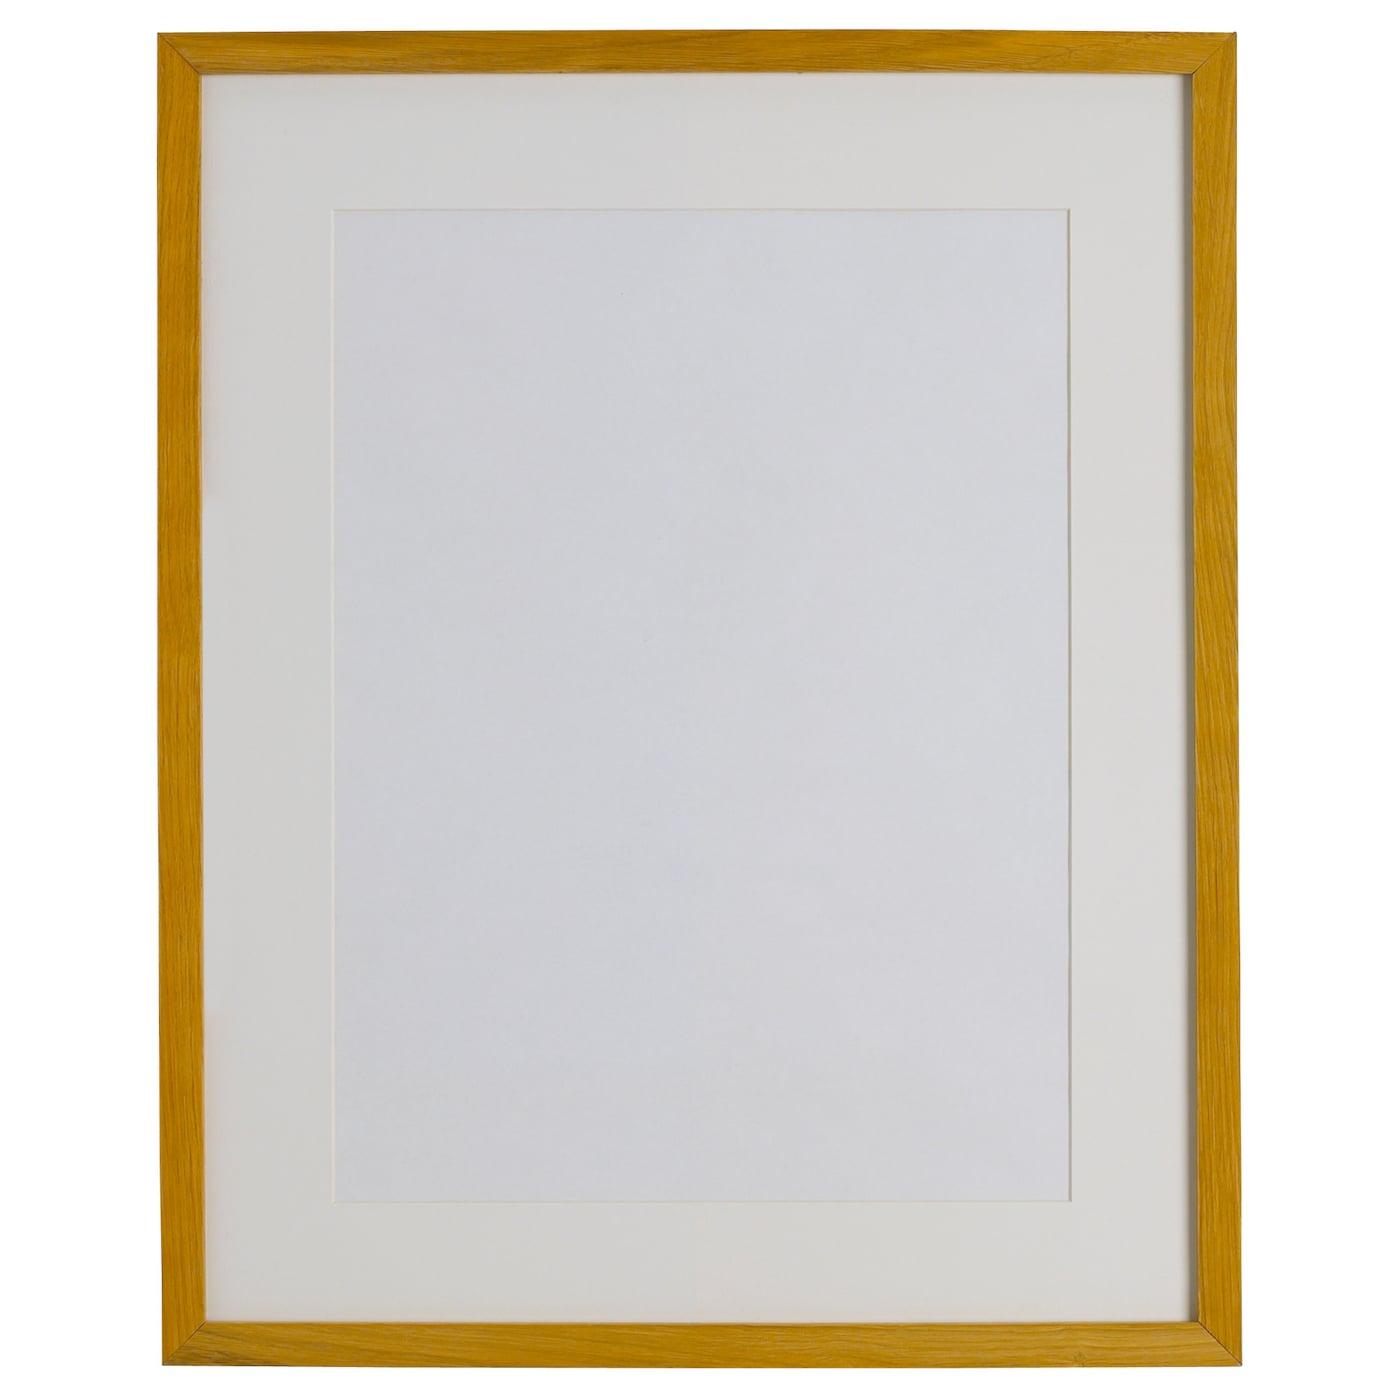 RIBBA Frame Oak effect 40 x 50 cm - IKEA